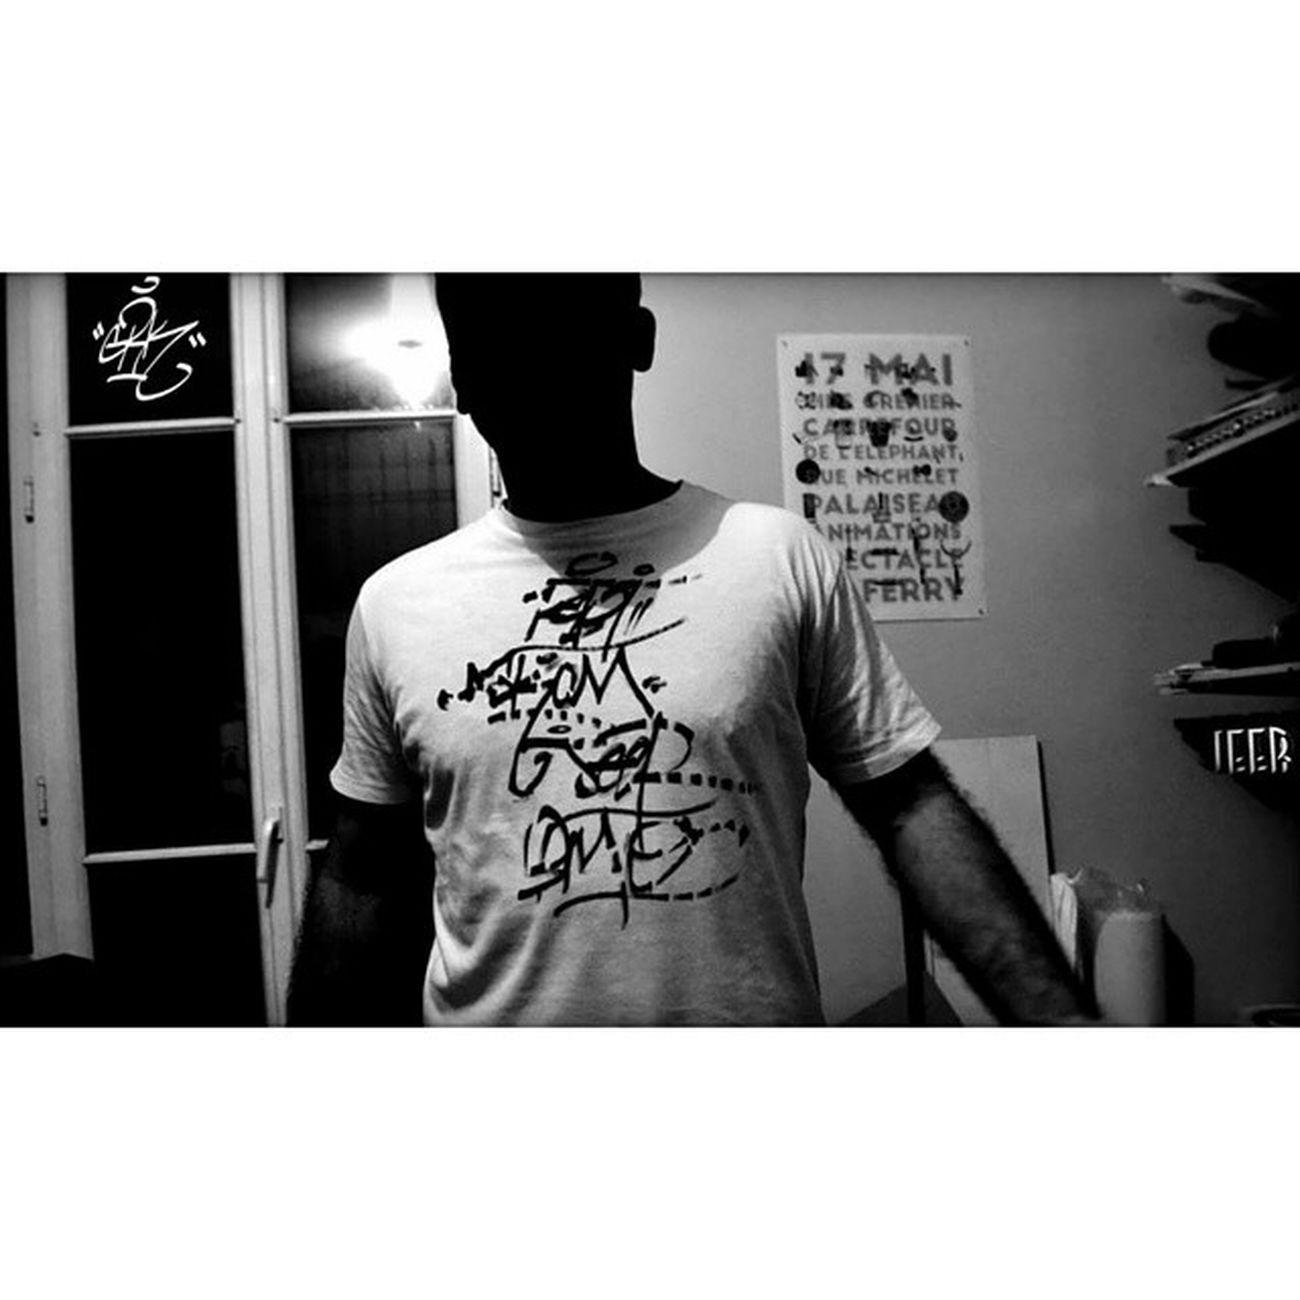 GRK 👕 Goldrushkingz Grkcrew Grkingz GRK Graffitiart Graffiti Graffitiwall